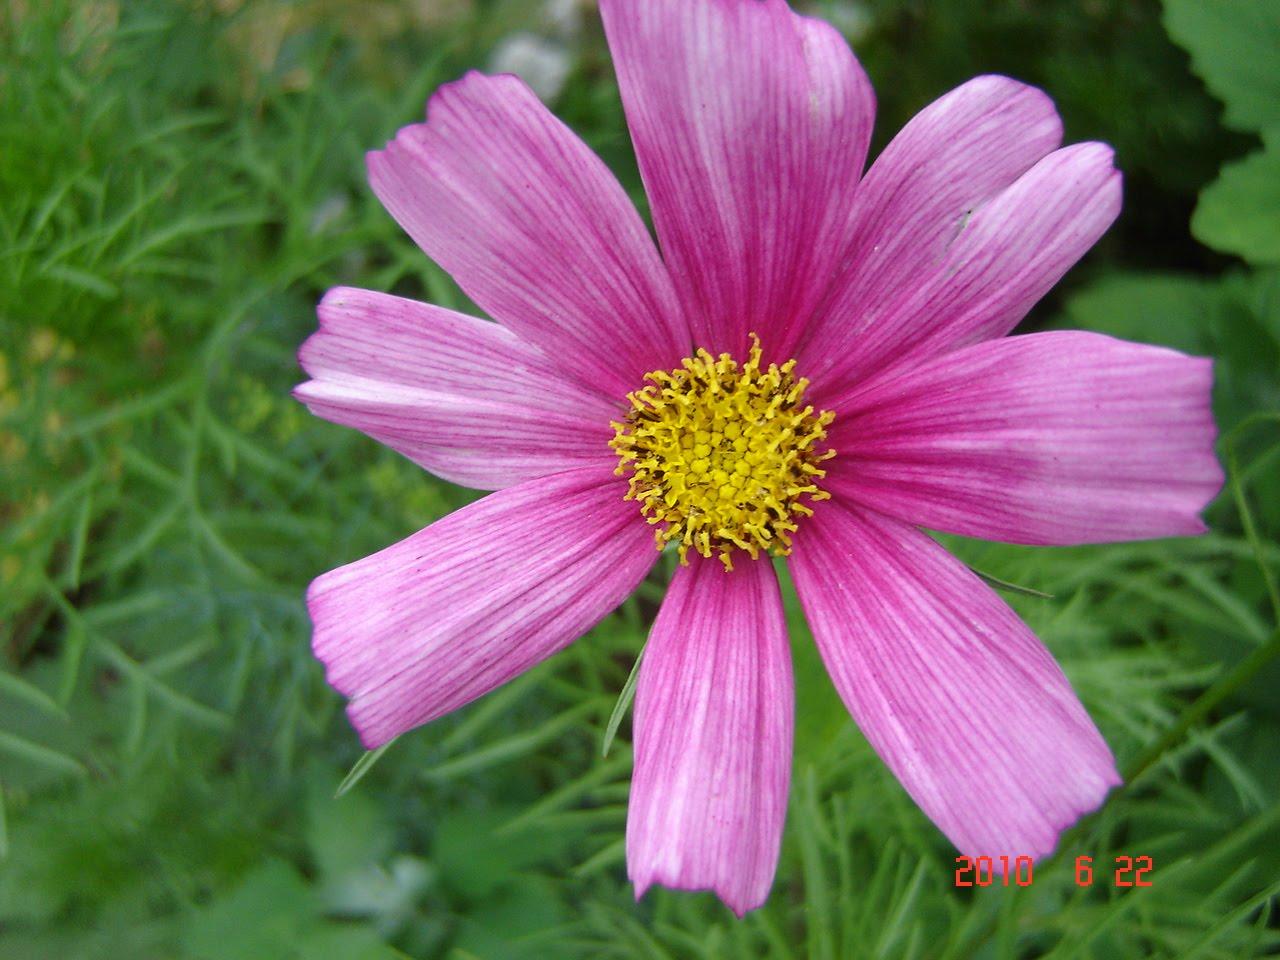 Dr Kim s Holistic Healing Happy Cosmos flower from my backyard garden